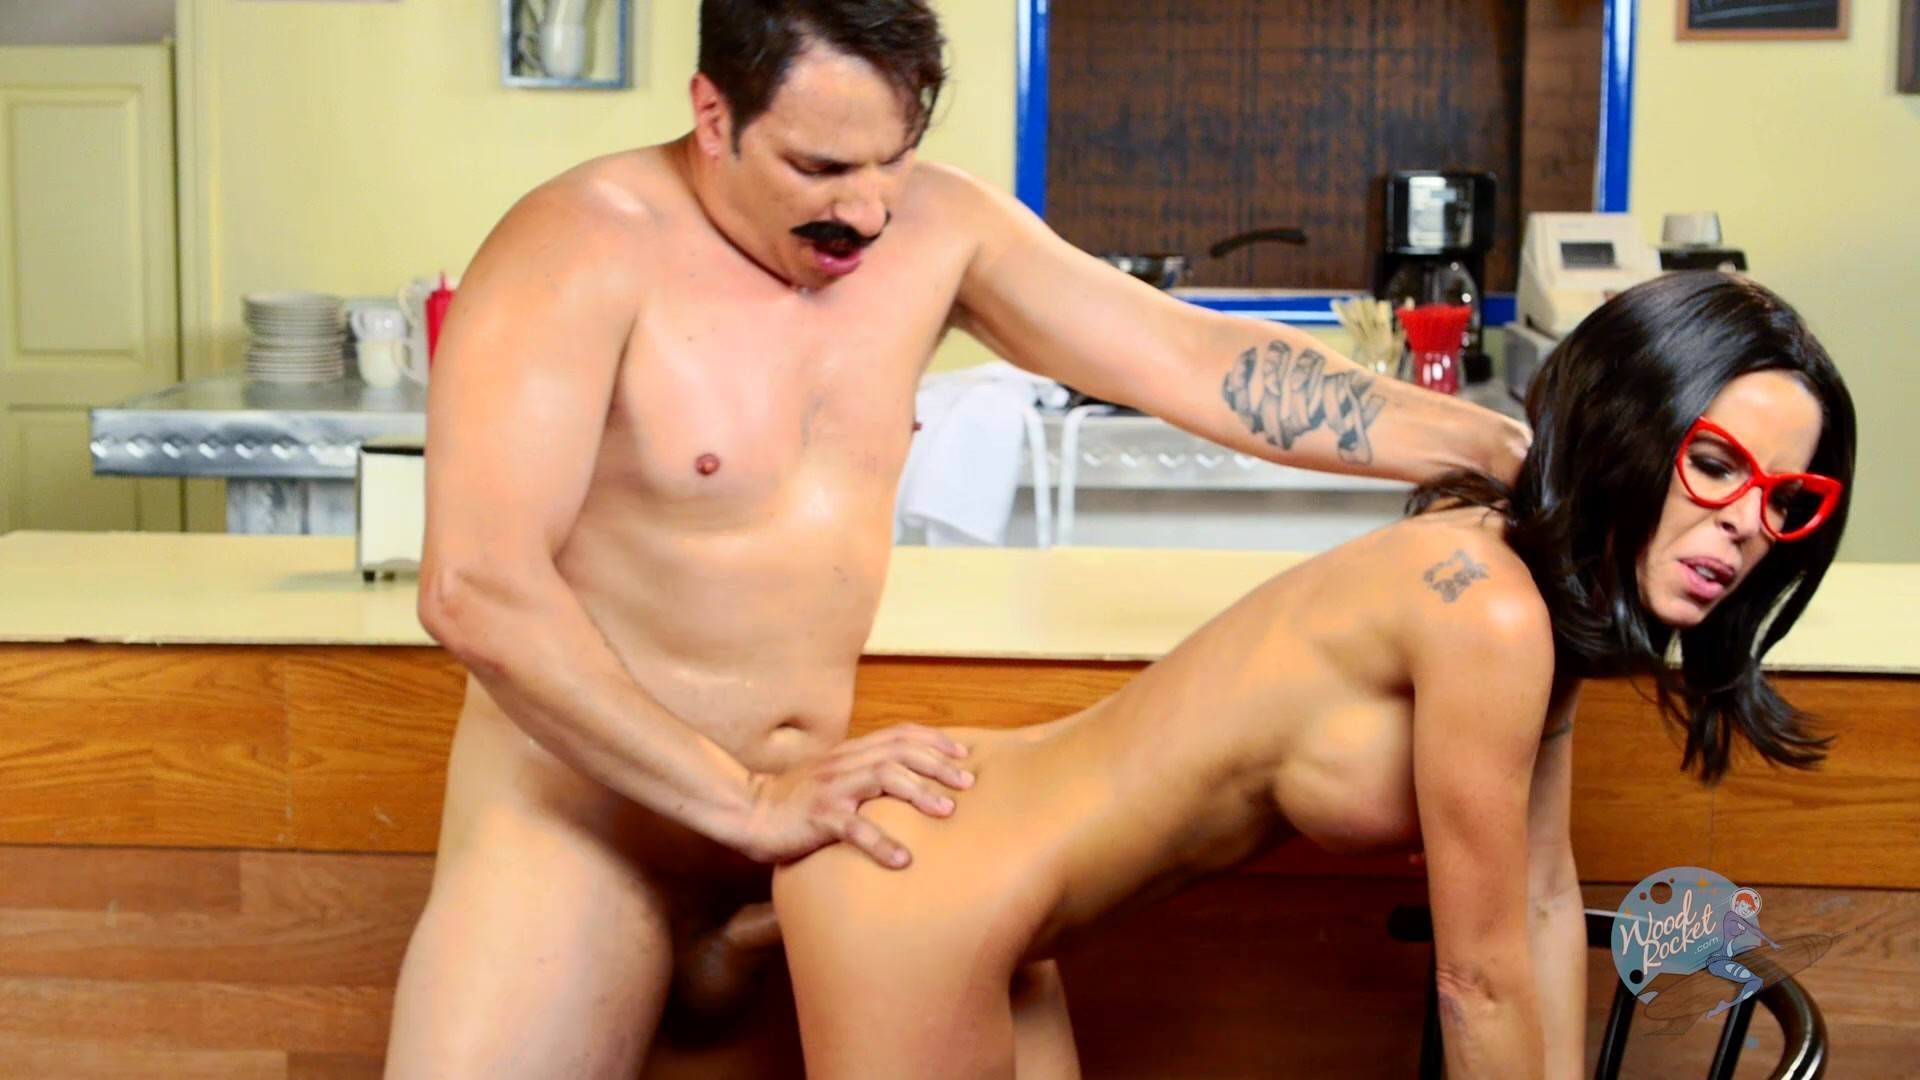 Free Bobs Burgers Porn bob's boners and other porn parodies (2014) | adult dvd empire